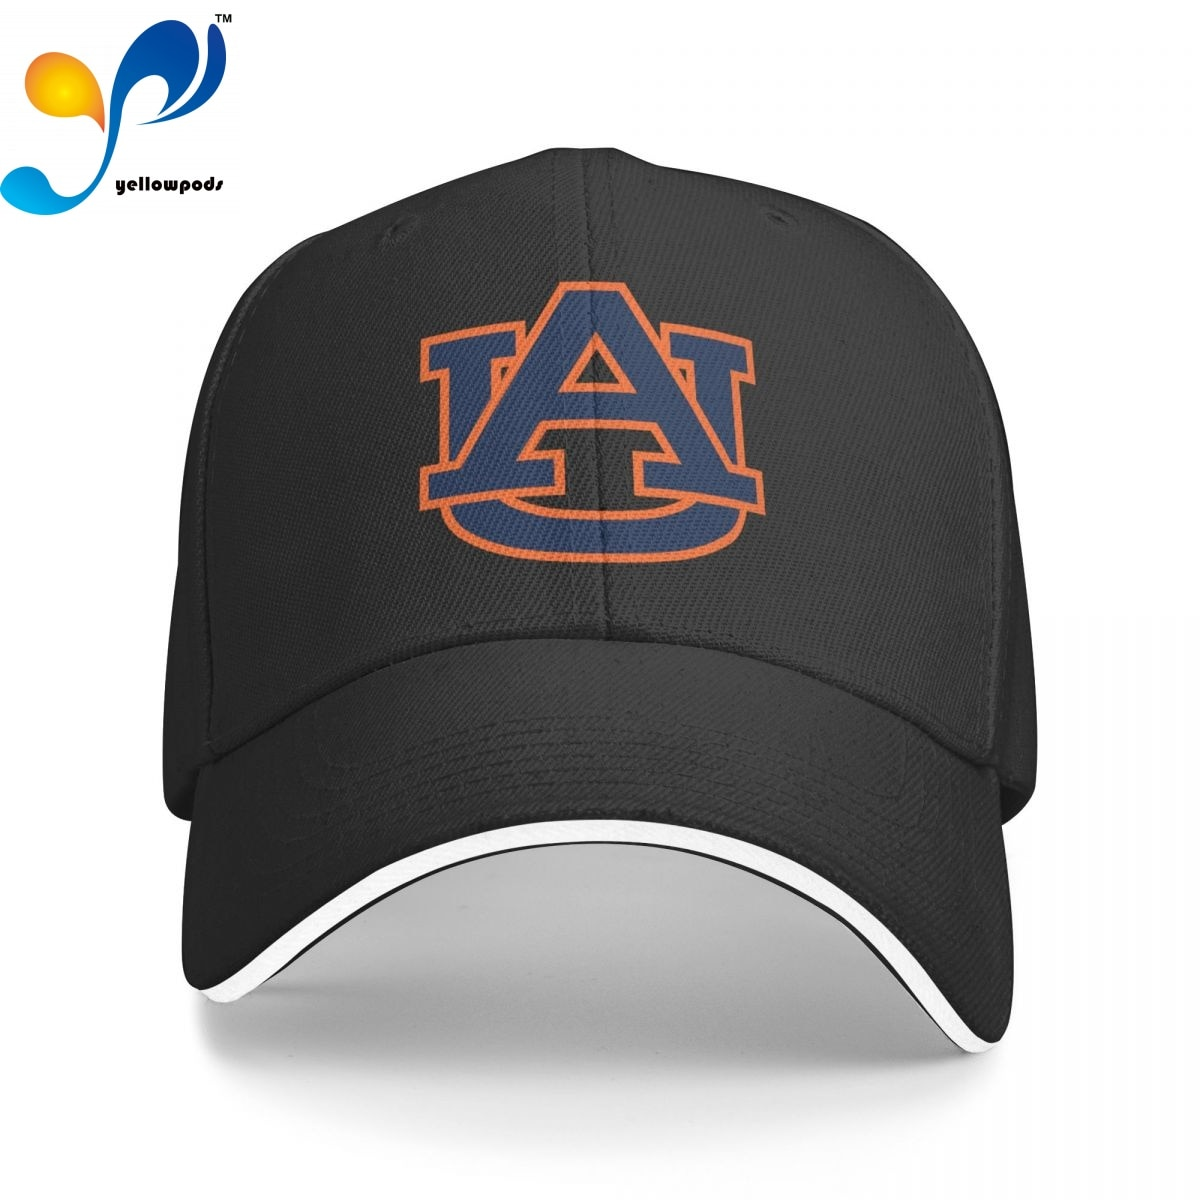 Auburn Кепка-тракер, бейсболка для мужчин, бейсболка с клапаном, мужские шапки, кепки с логотипом